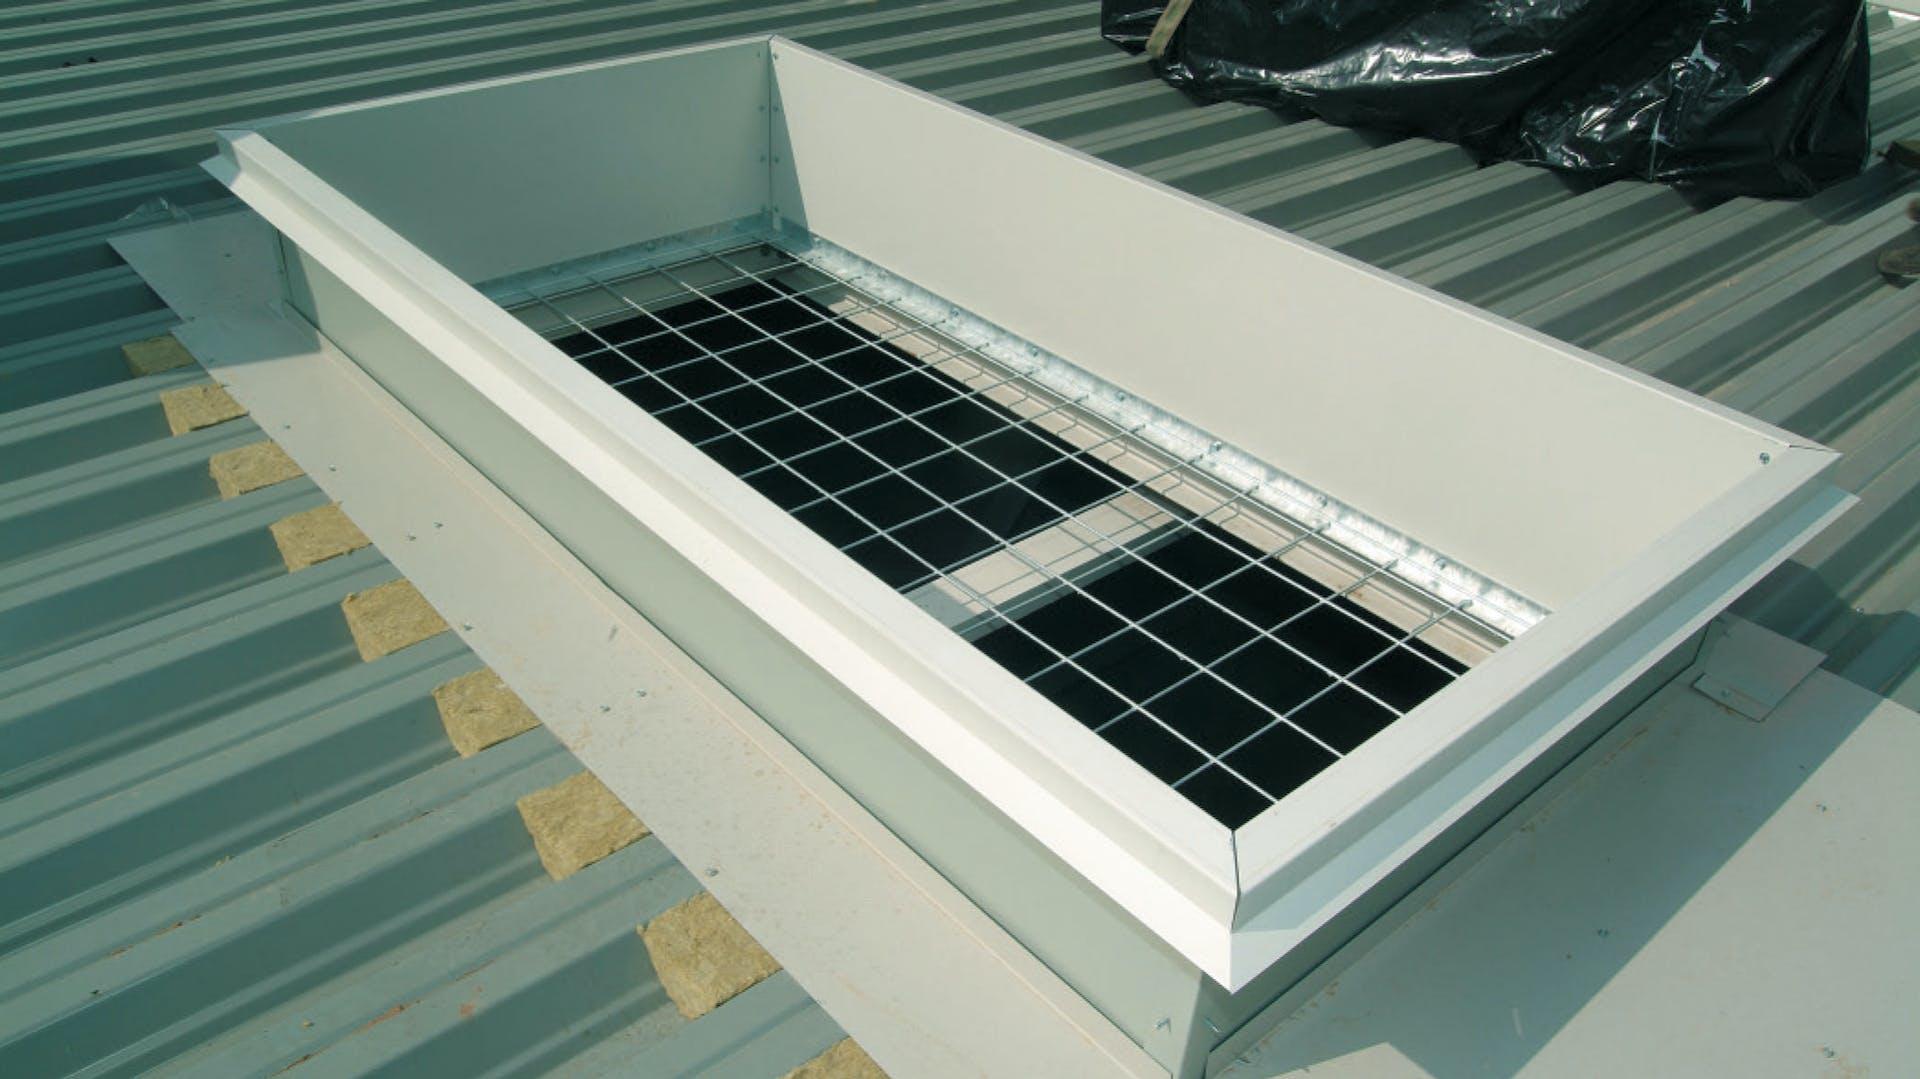 brandschutz profilfüller, flat roof, product germany